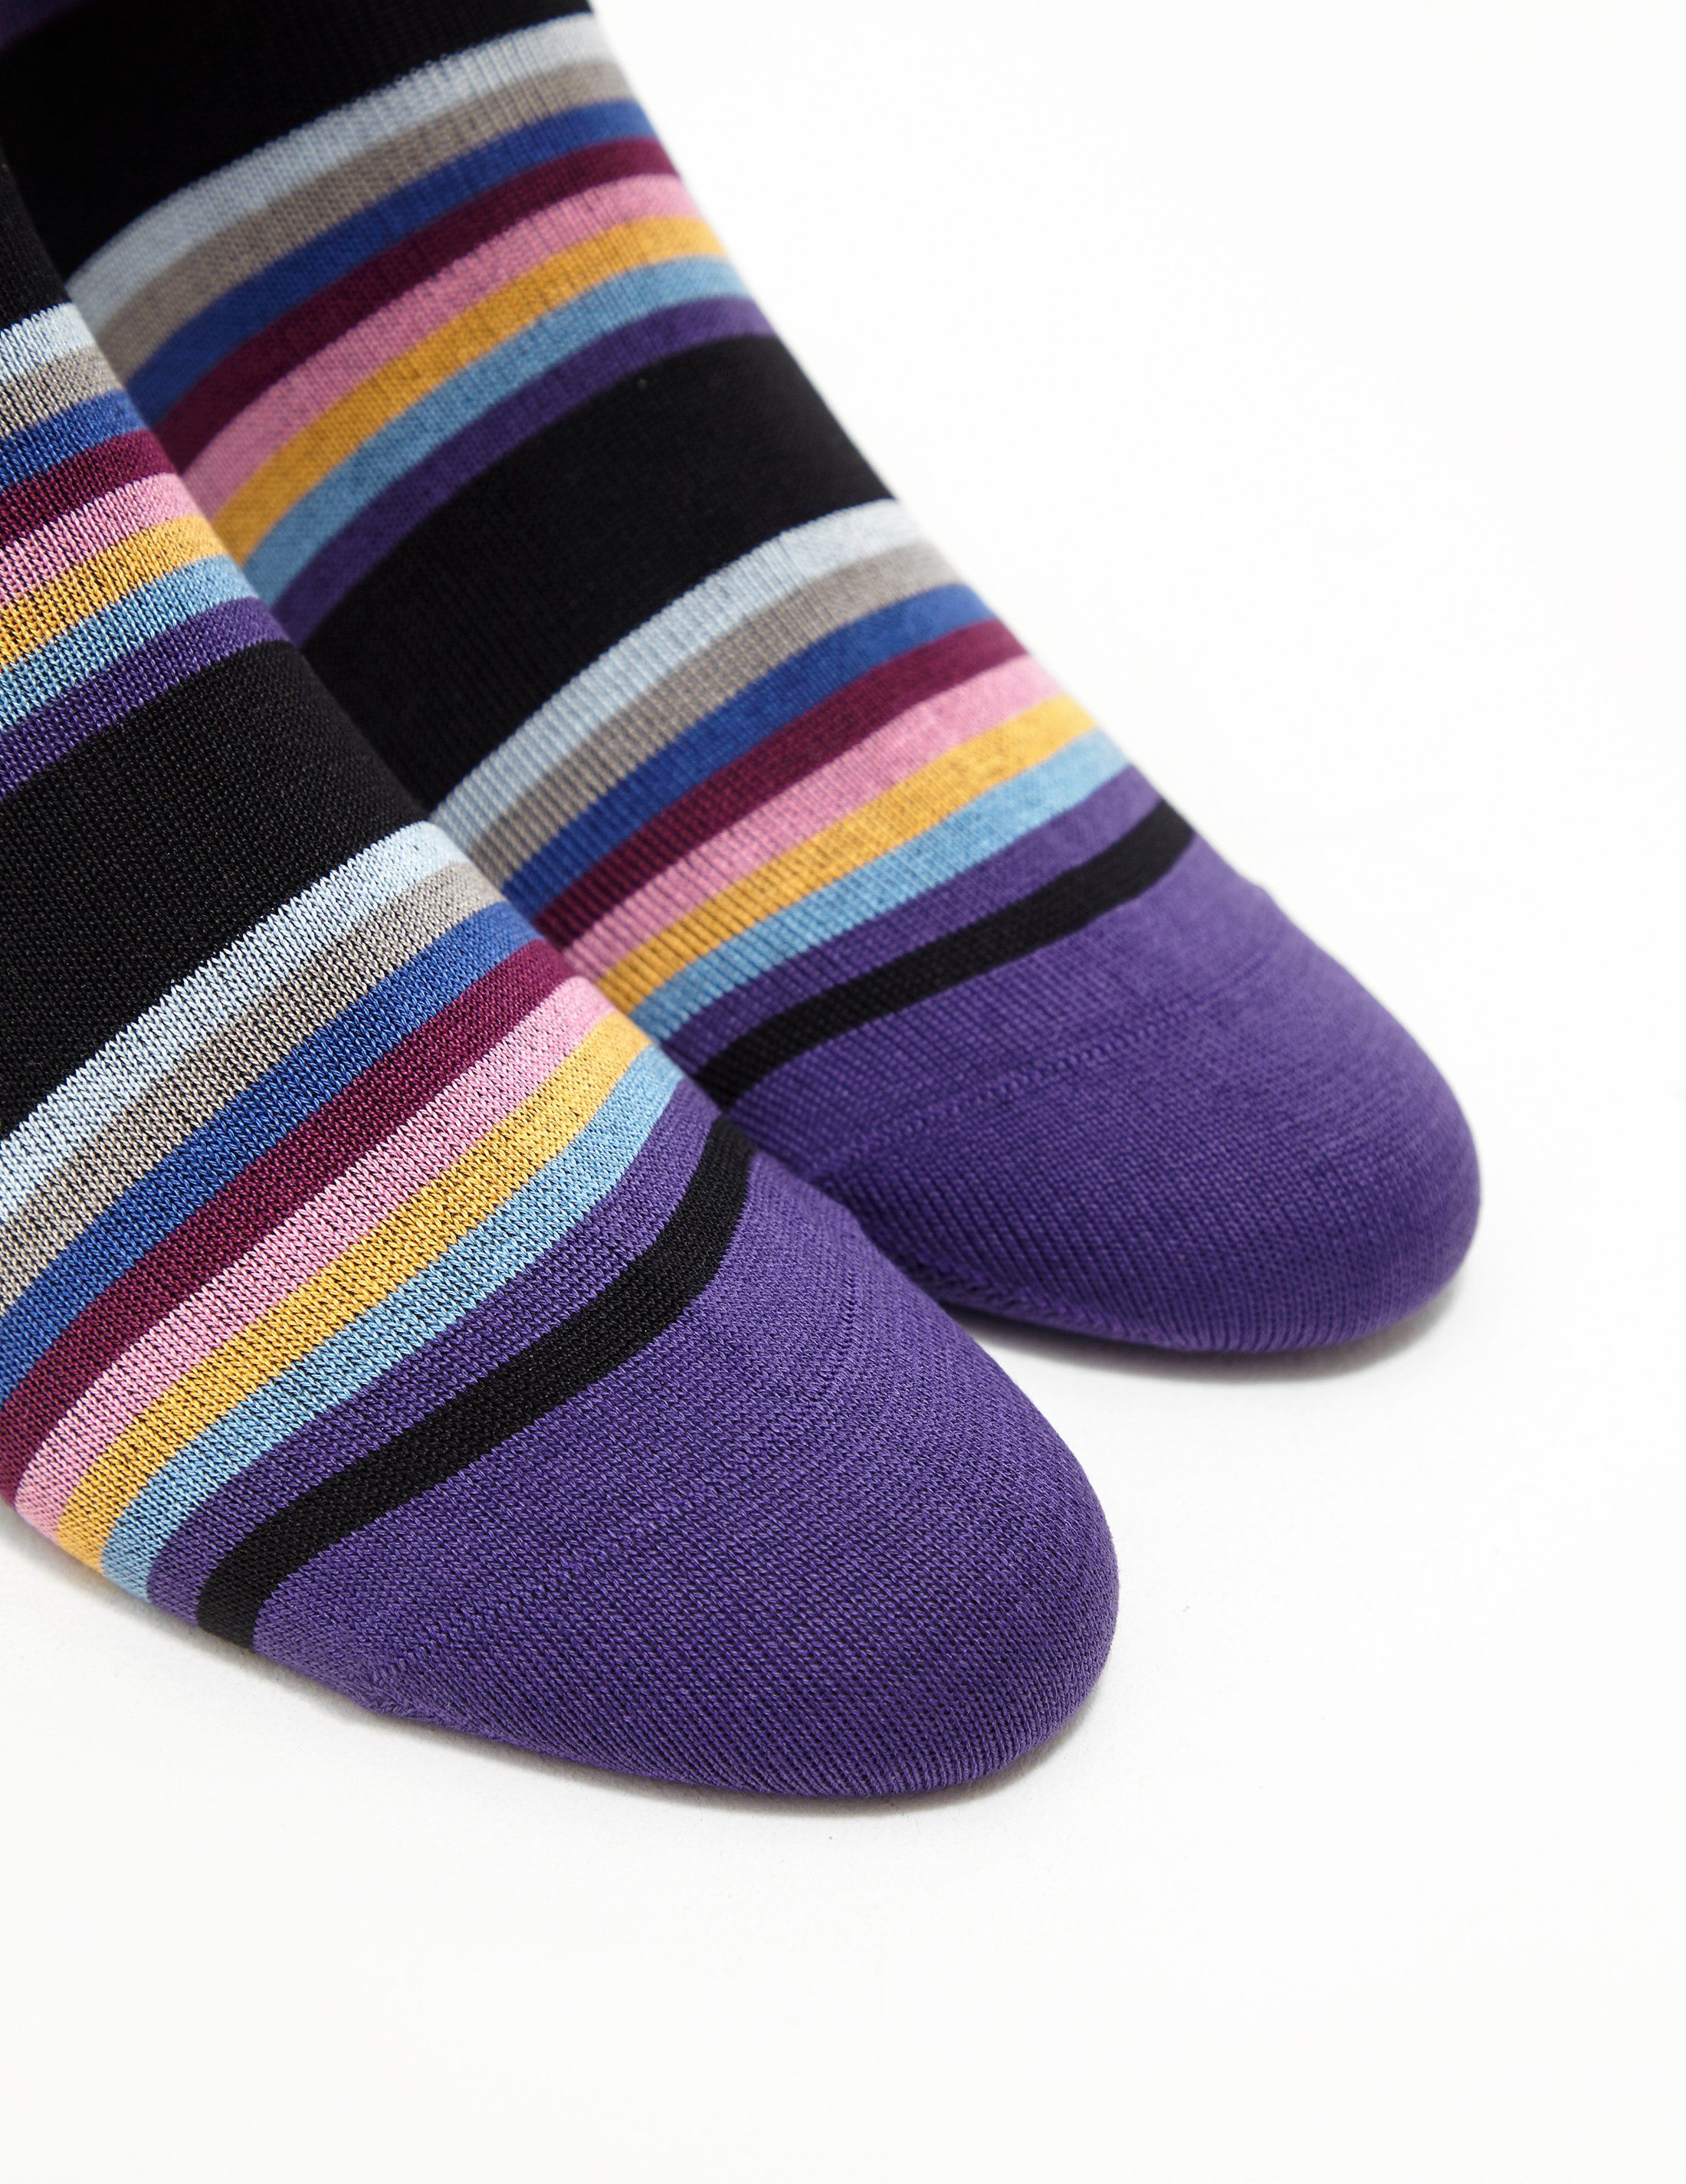 PS Paul Smith Bono Stripe Socks - Online Exclusive